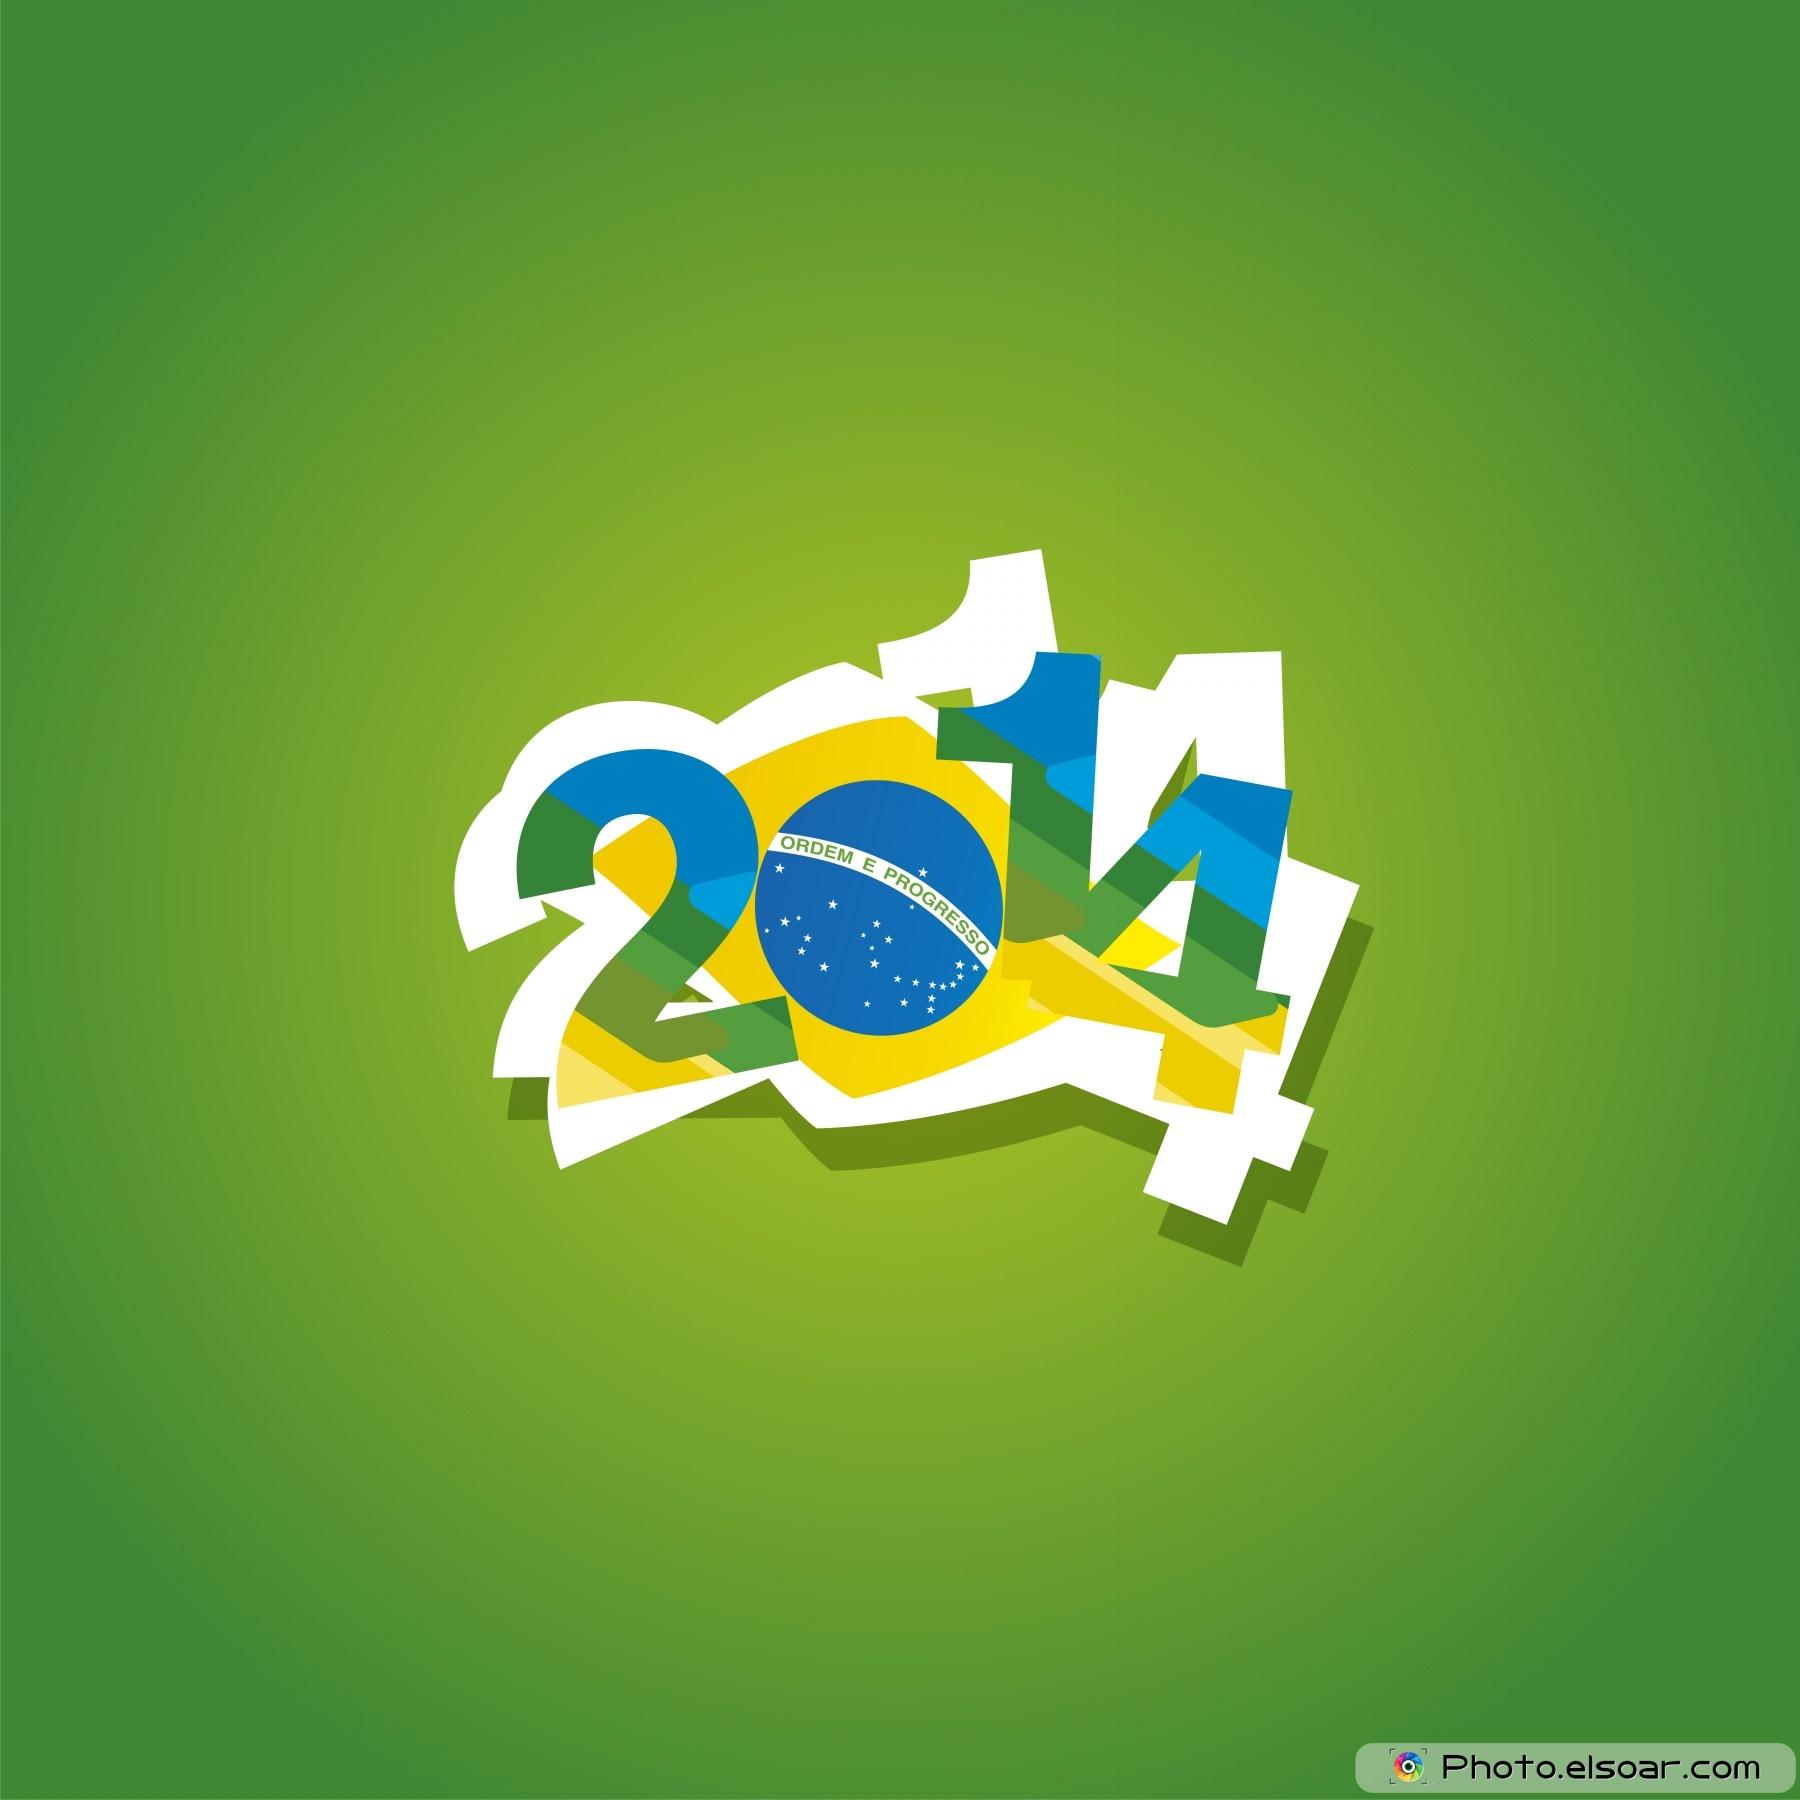 Brazil 2014 Wallpaper